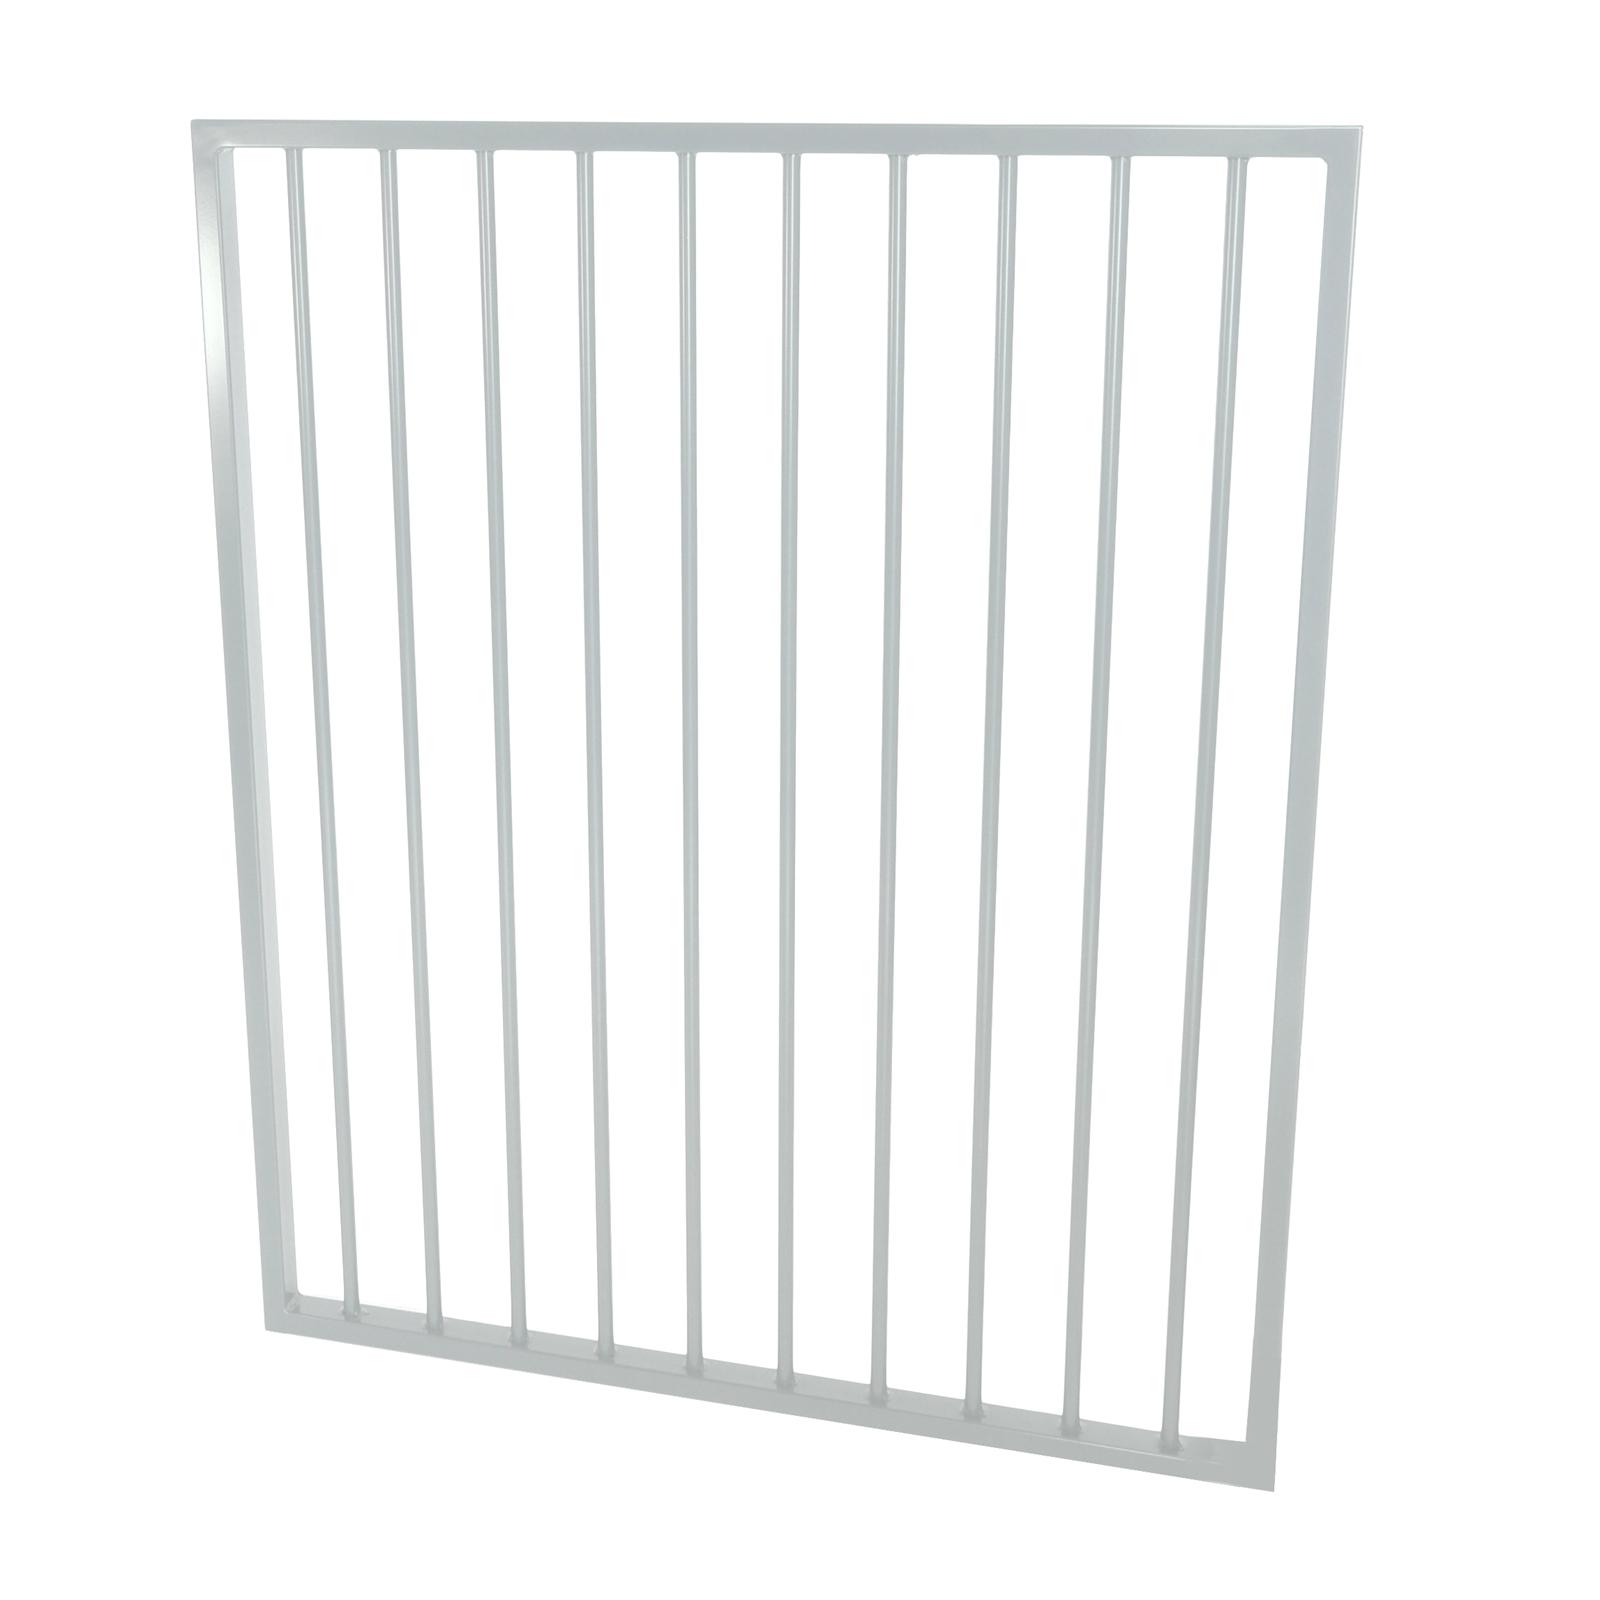 Protector Aluminium 975 x 1200mm Flat Top Ulti-M8 Pool Gate - Pearl White